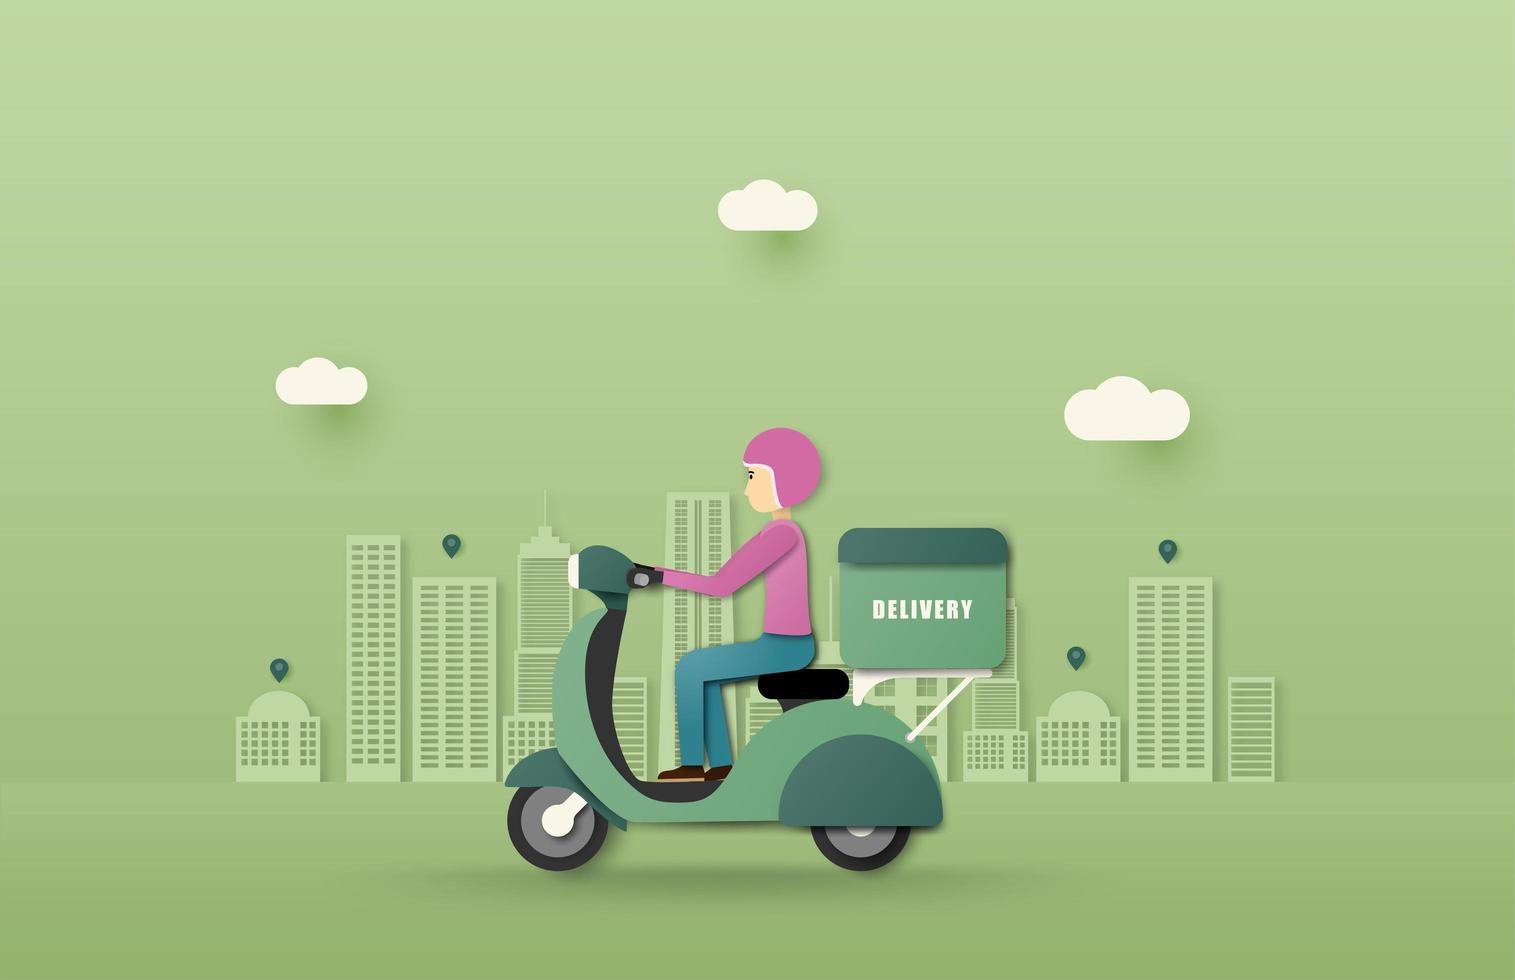 online-leveransservice leverans skoter körning vektor